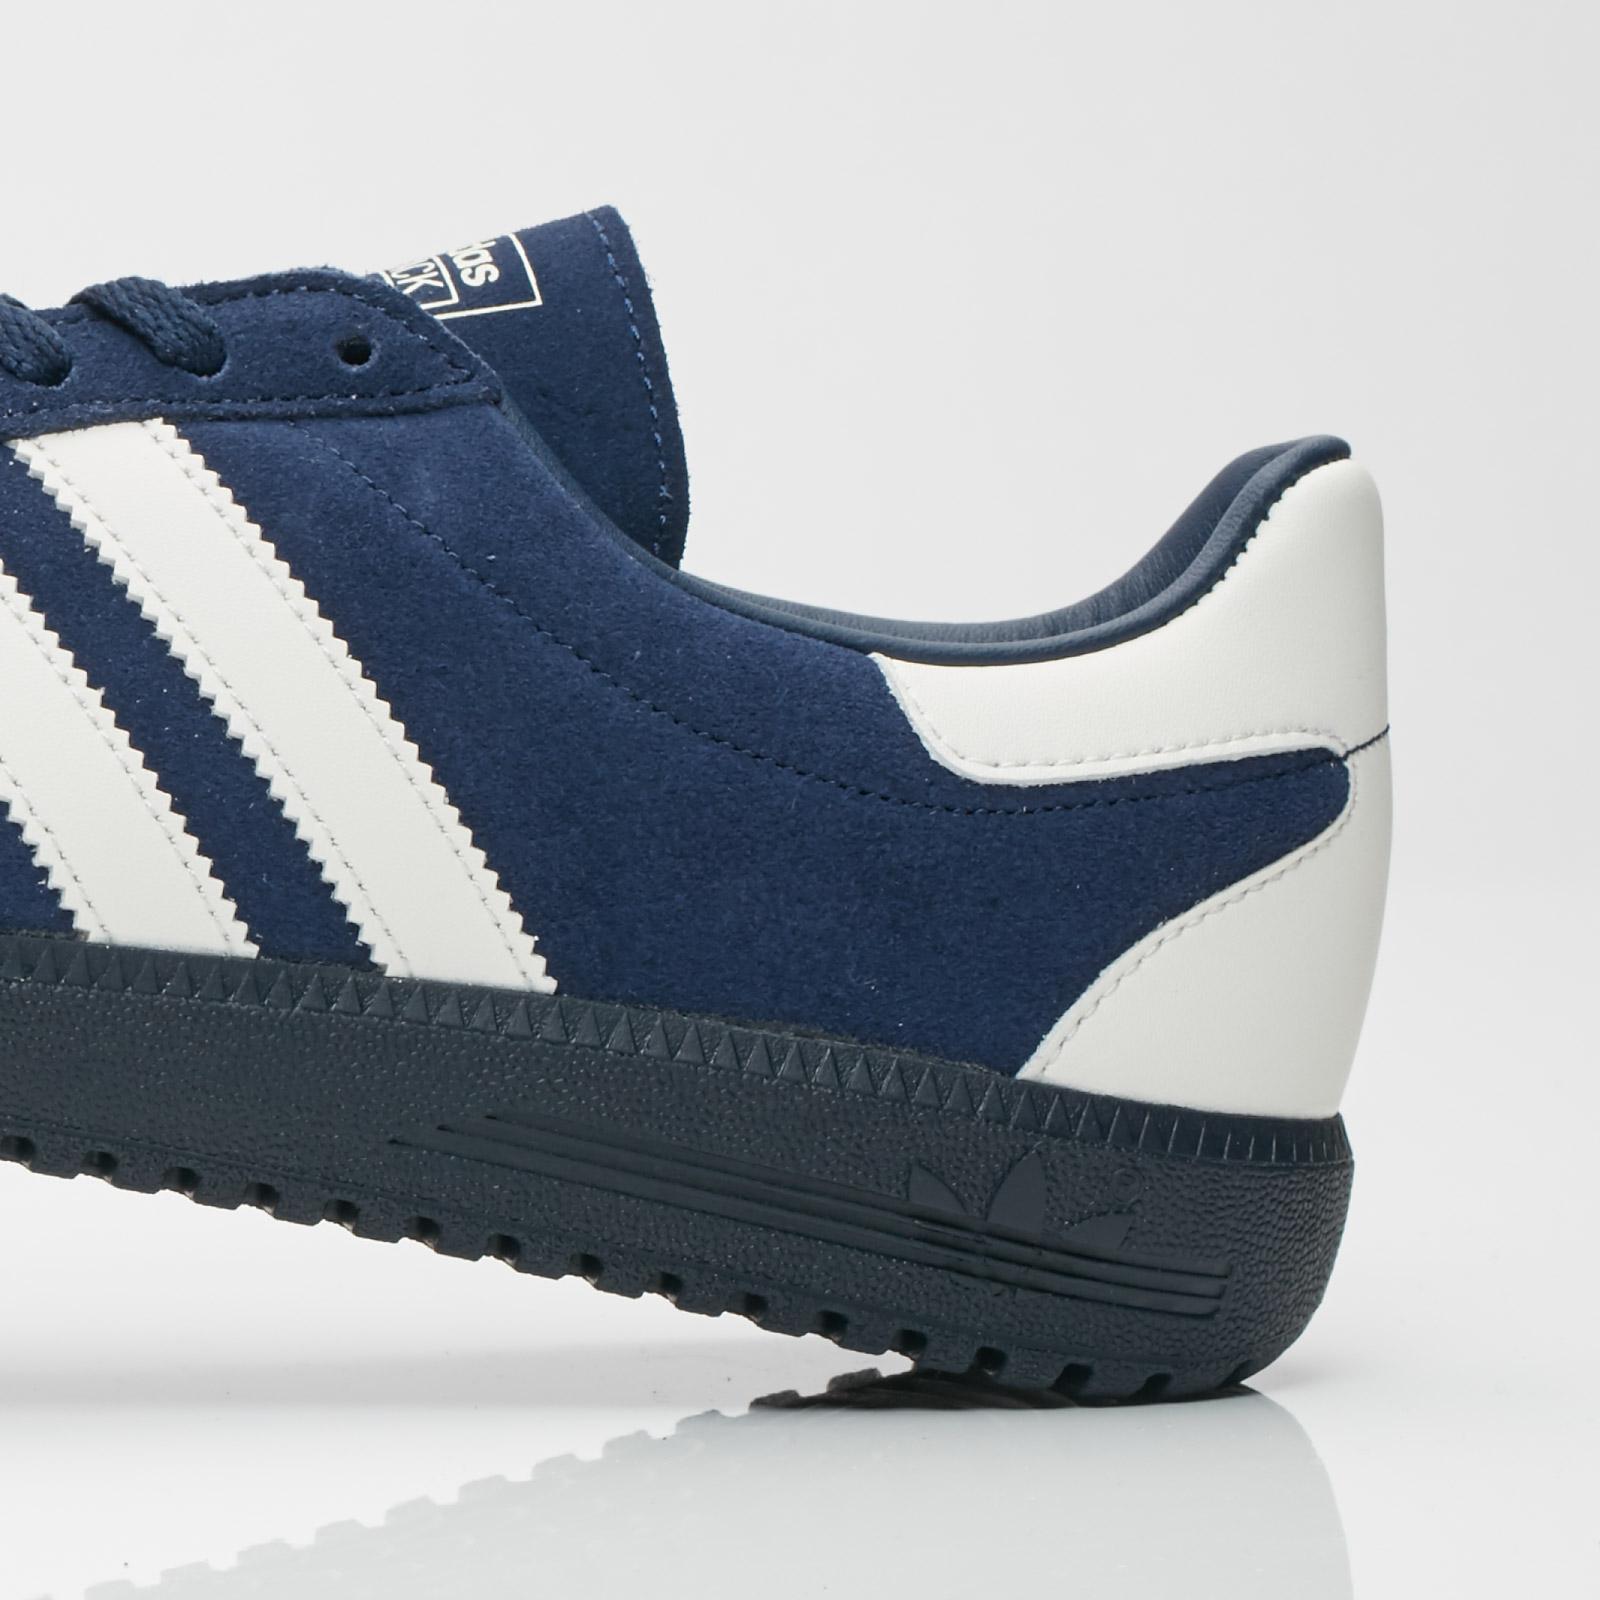 adidas Intack - Cg2918 - Sneakersnstuff